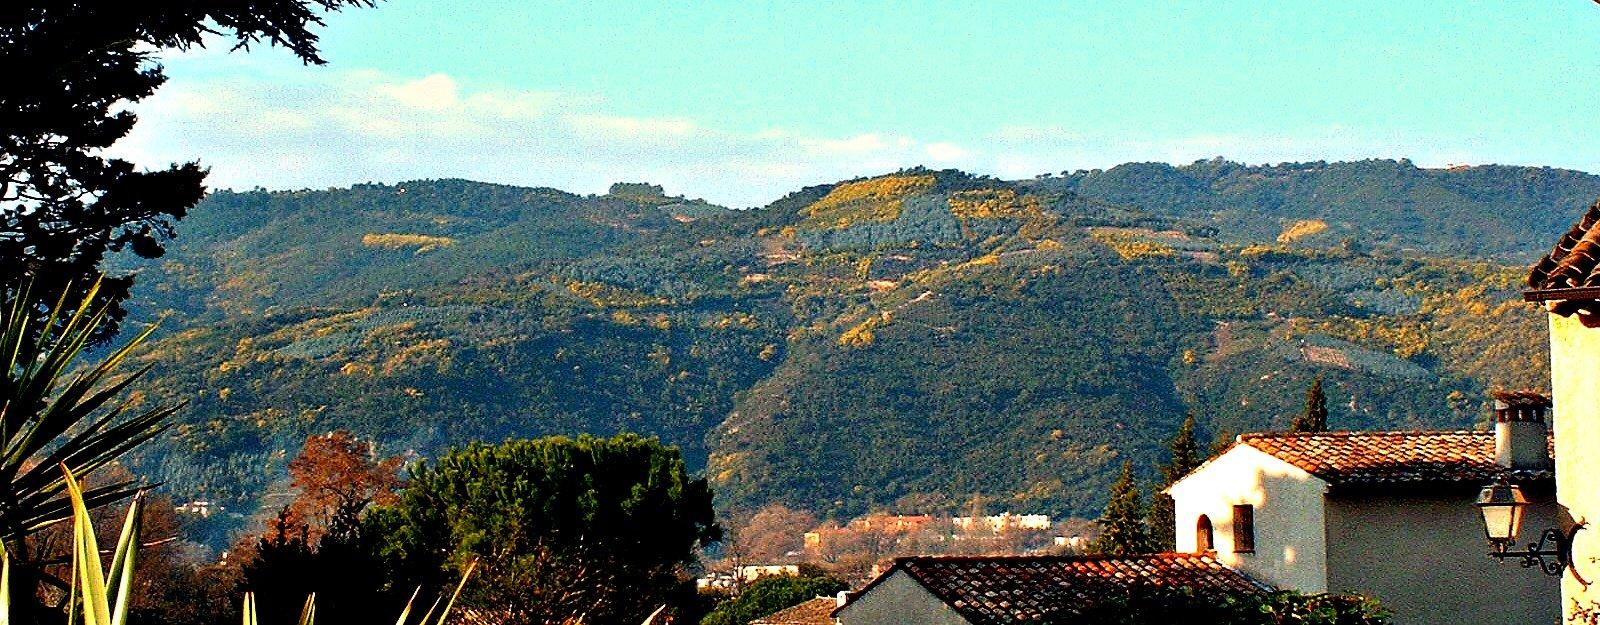 Villa Carpe Diem Views Over Esterel Hills